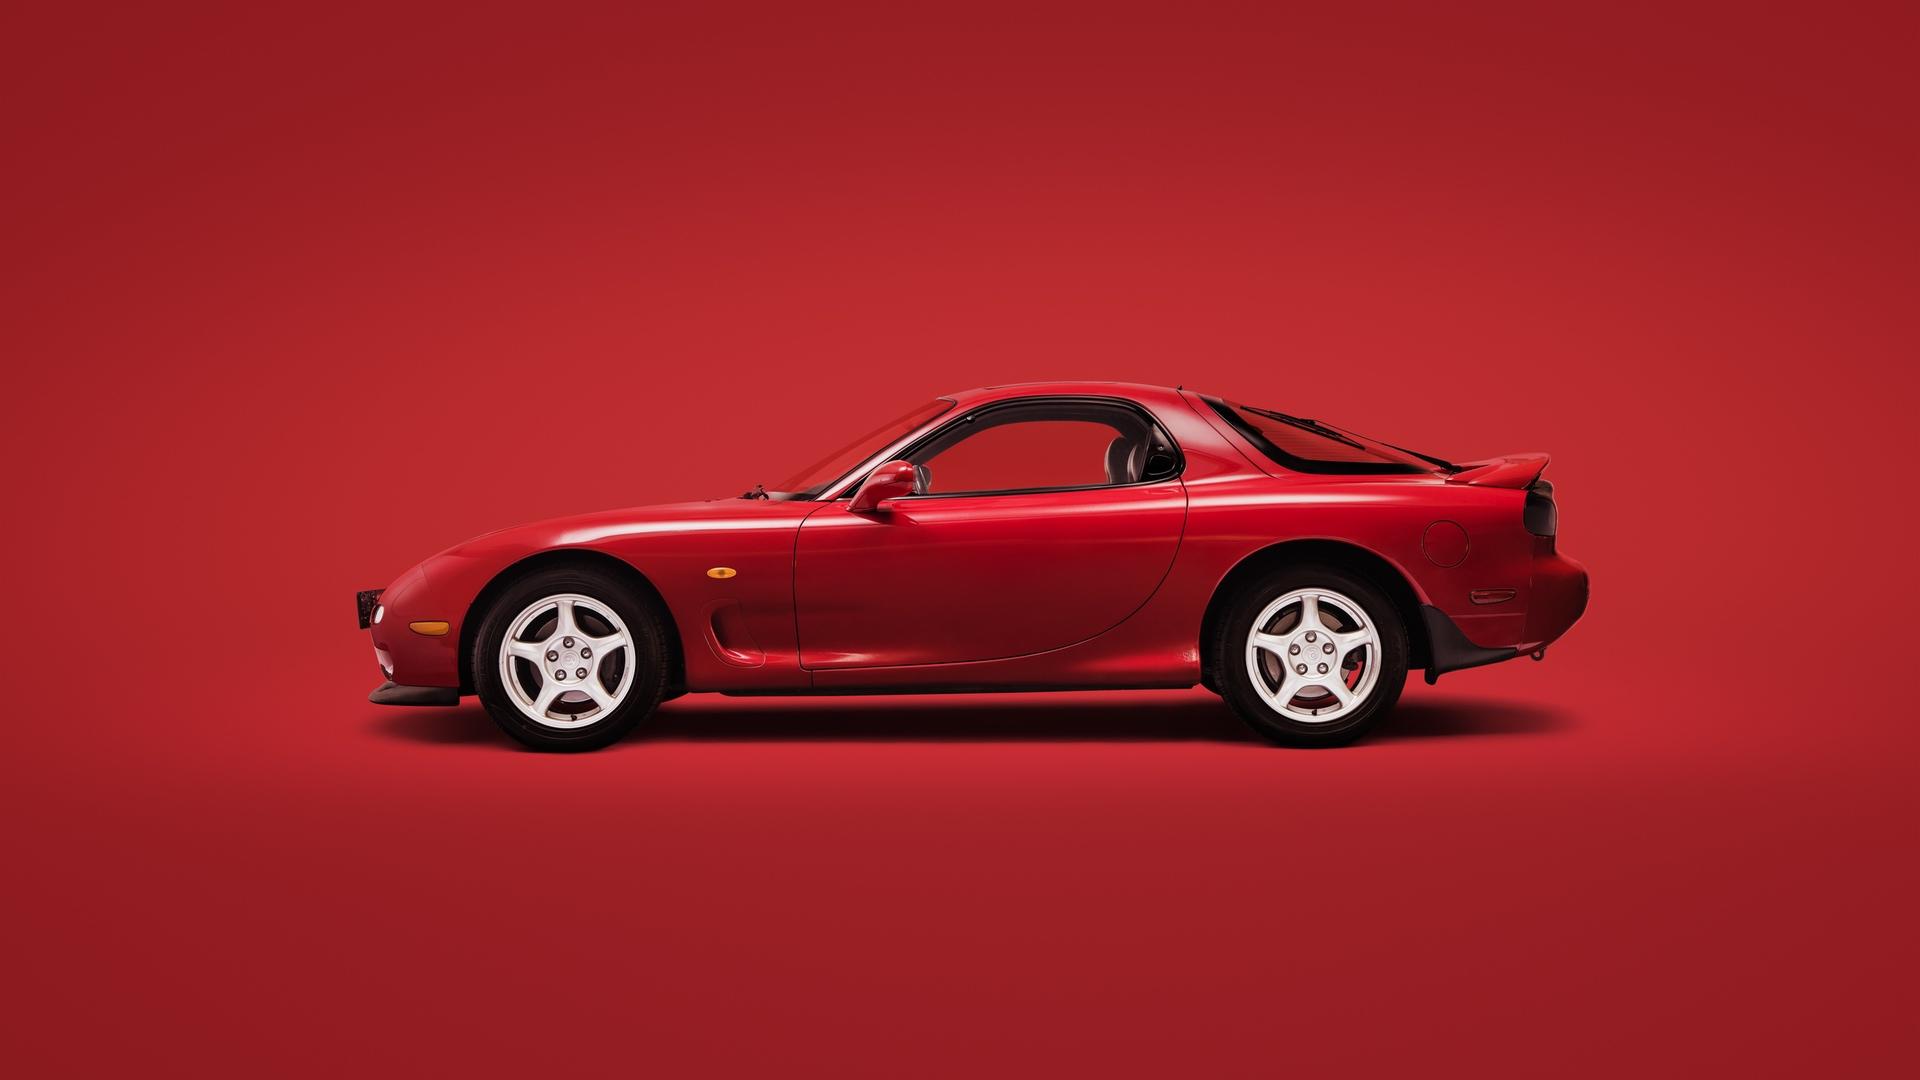 Mazda_RX-7_history_0011